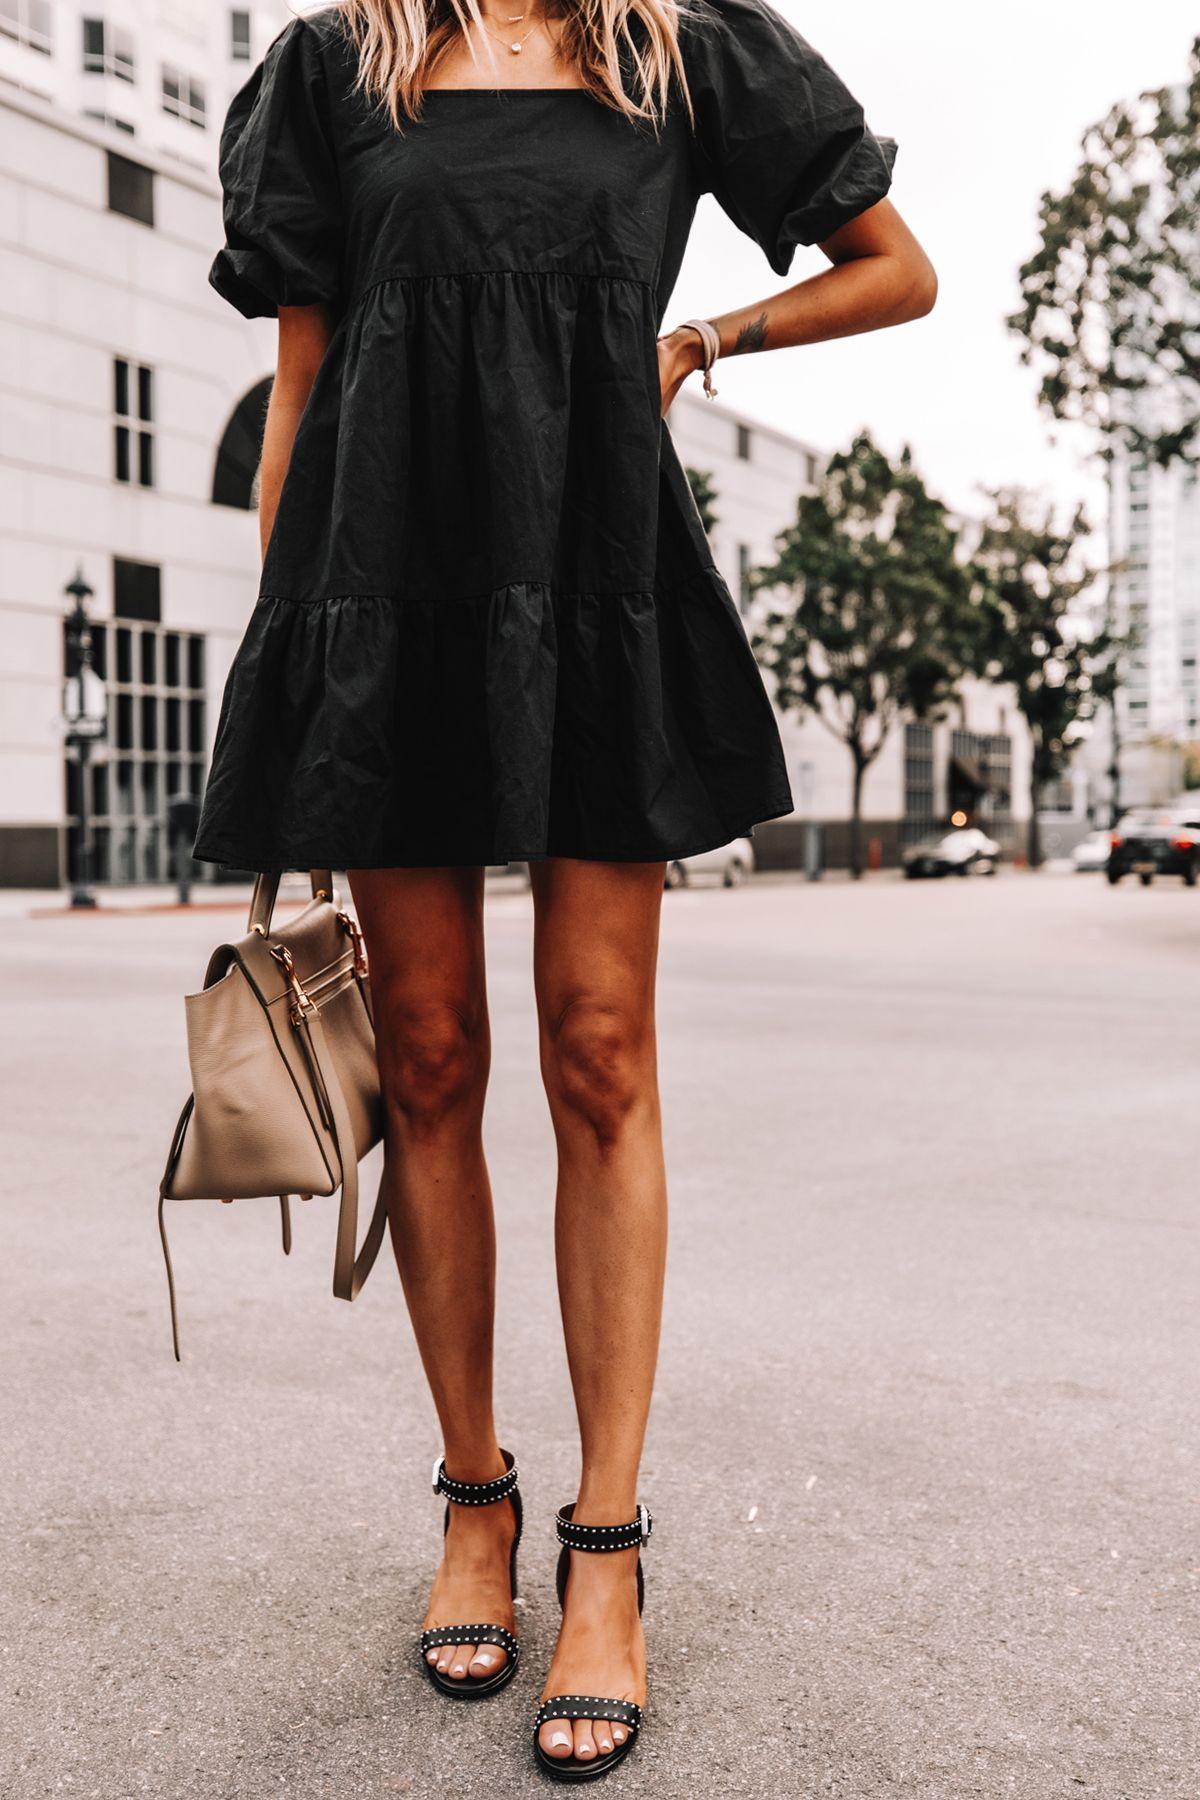 Summer Sandal And Flip Flop Round Up Fashion Jackson Fashion Jackson Fashion Black Summer Outfits [ 1800 x 1200 Pixel ]